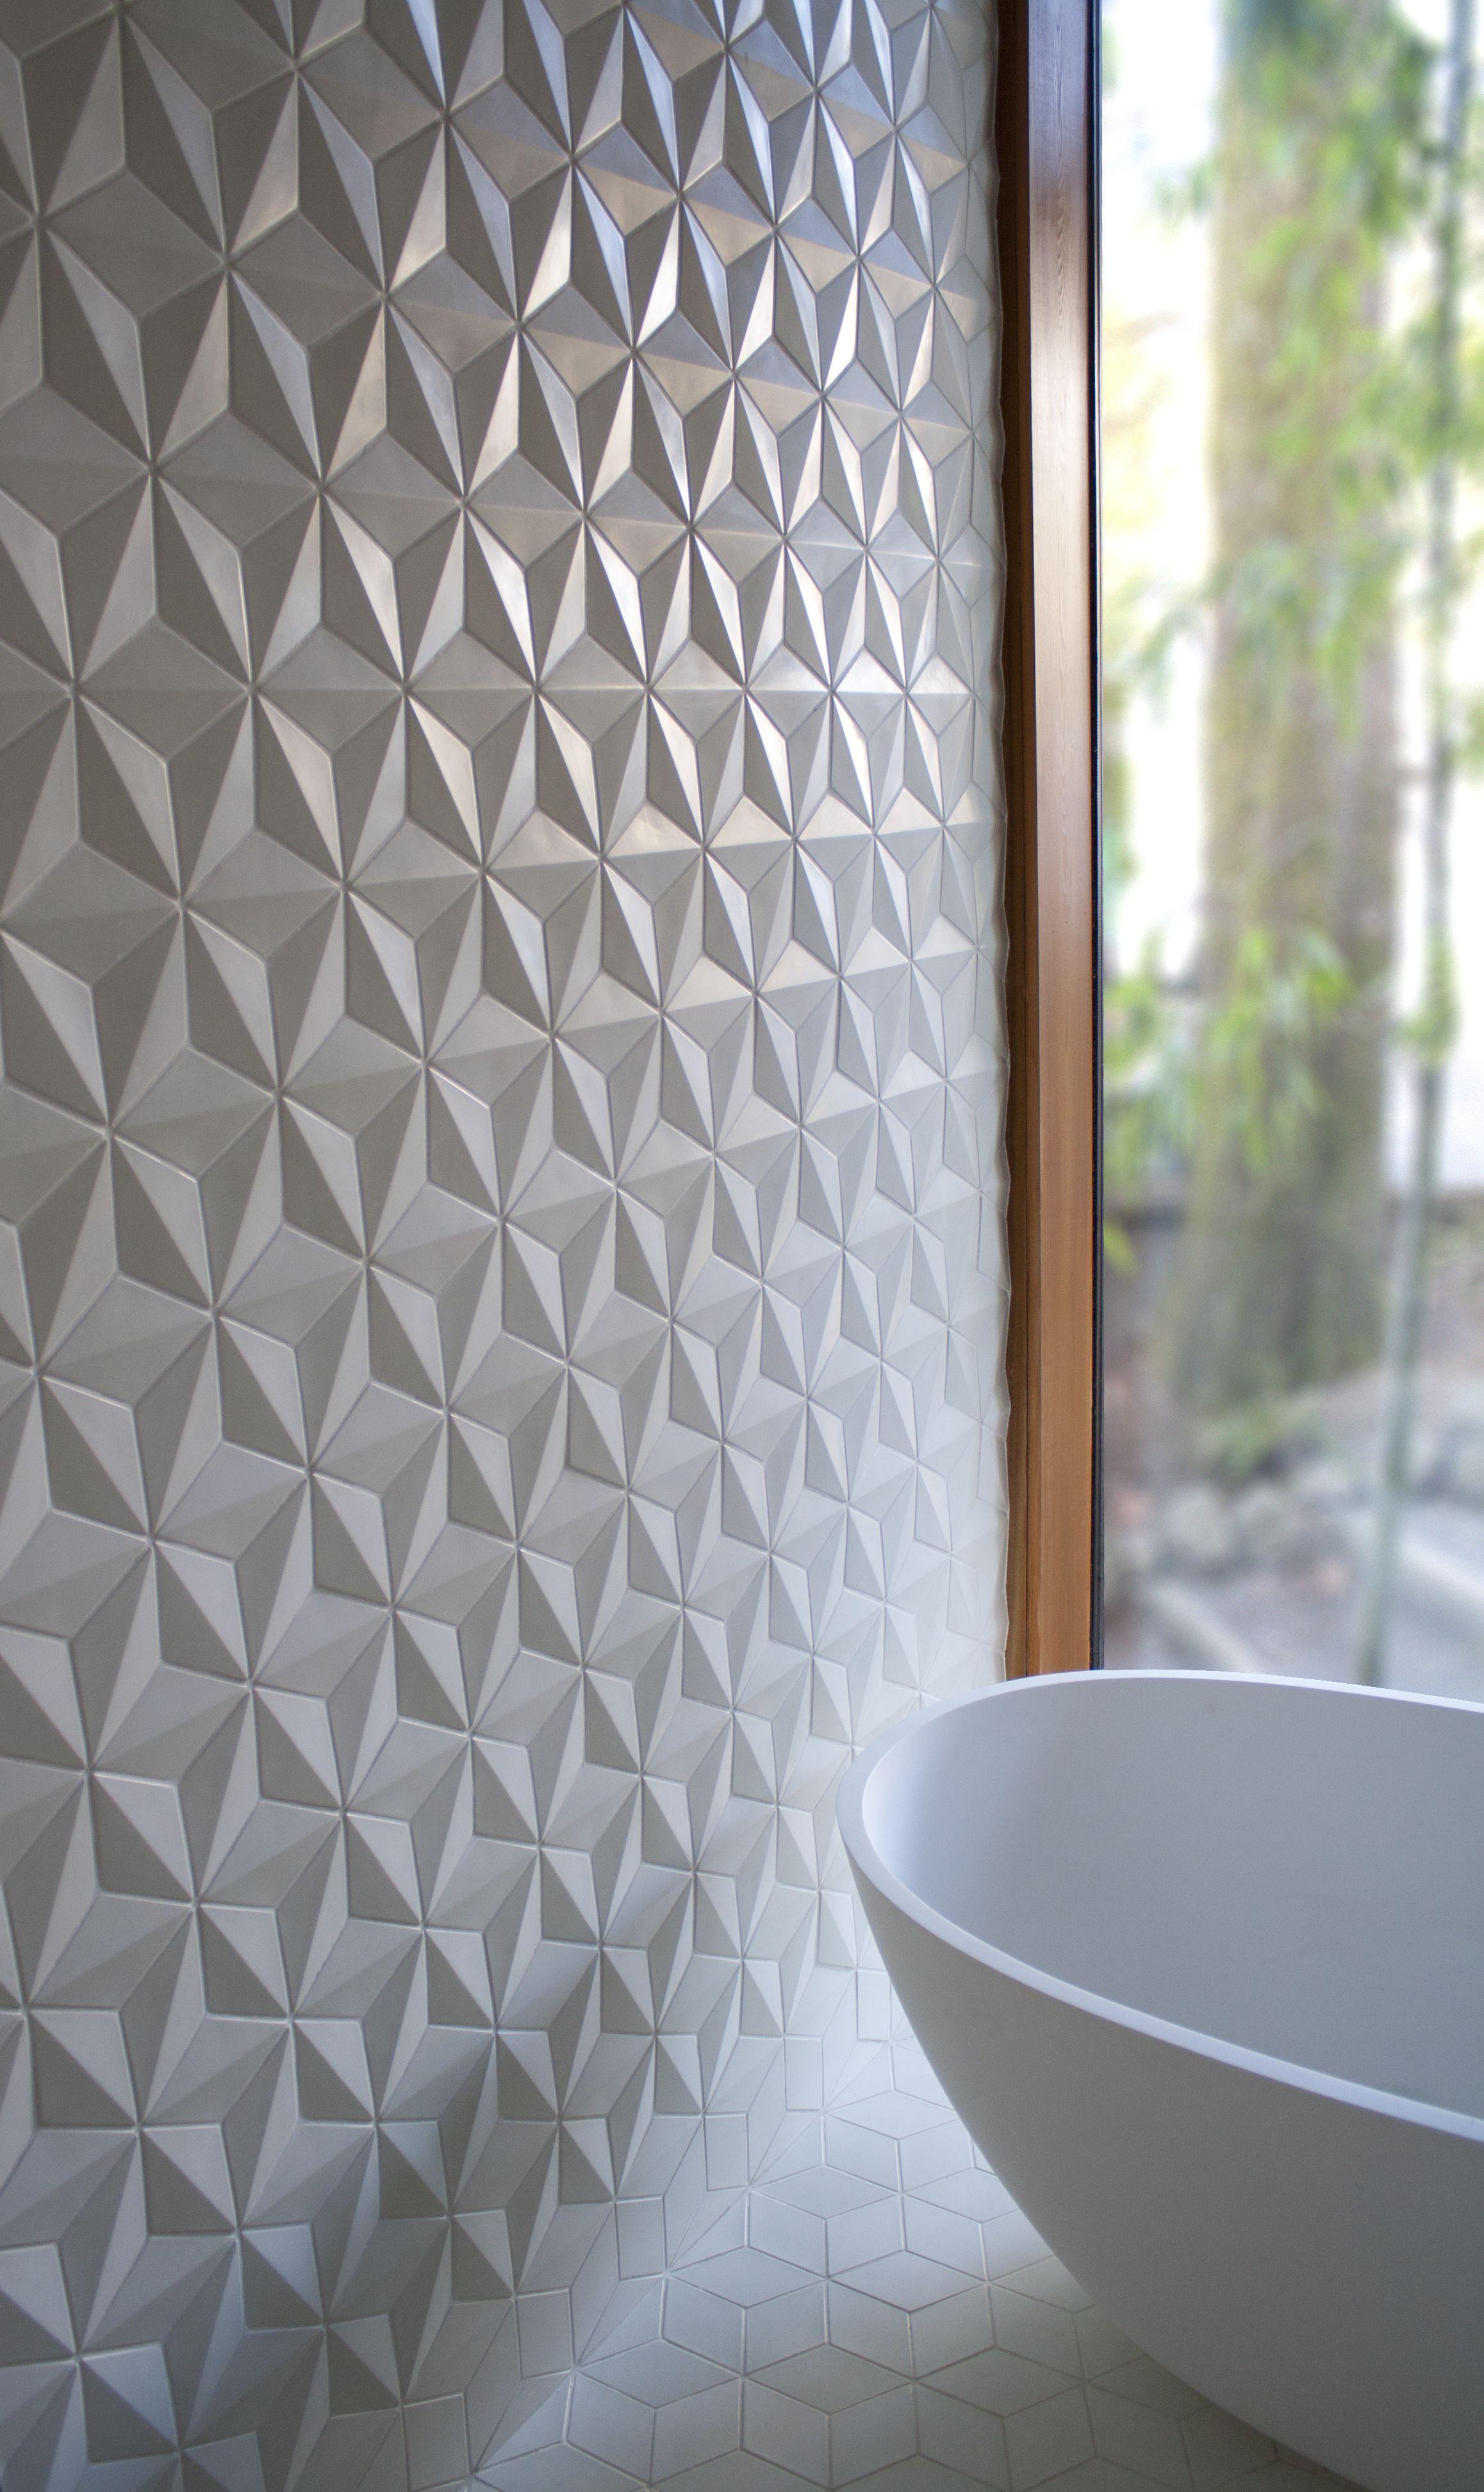 Delta Hex Tiles Stunning Wall Cladding Bathroom House Design Tiles